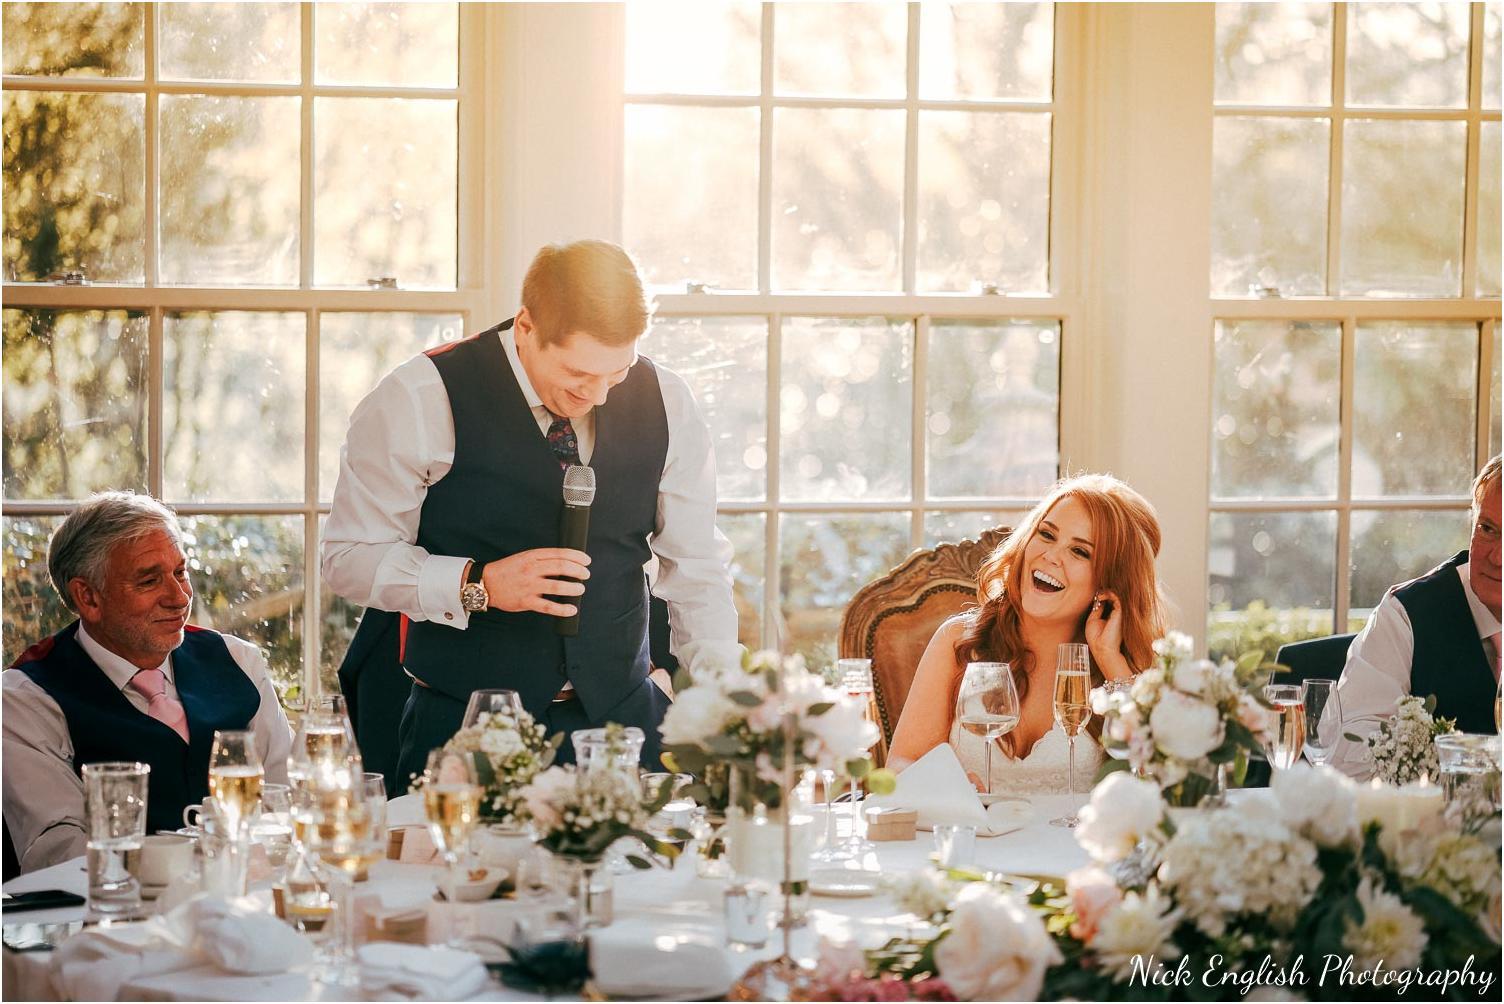 Mitton_Hall_Wedding_Photographer-170.jpg